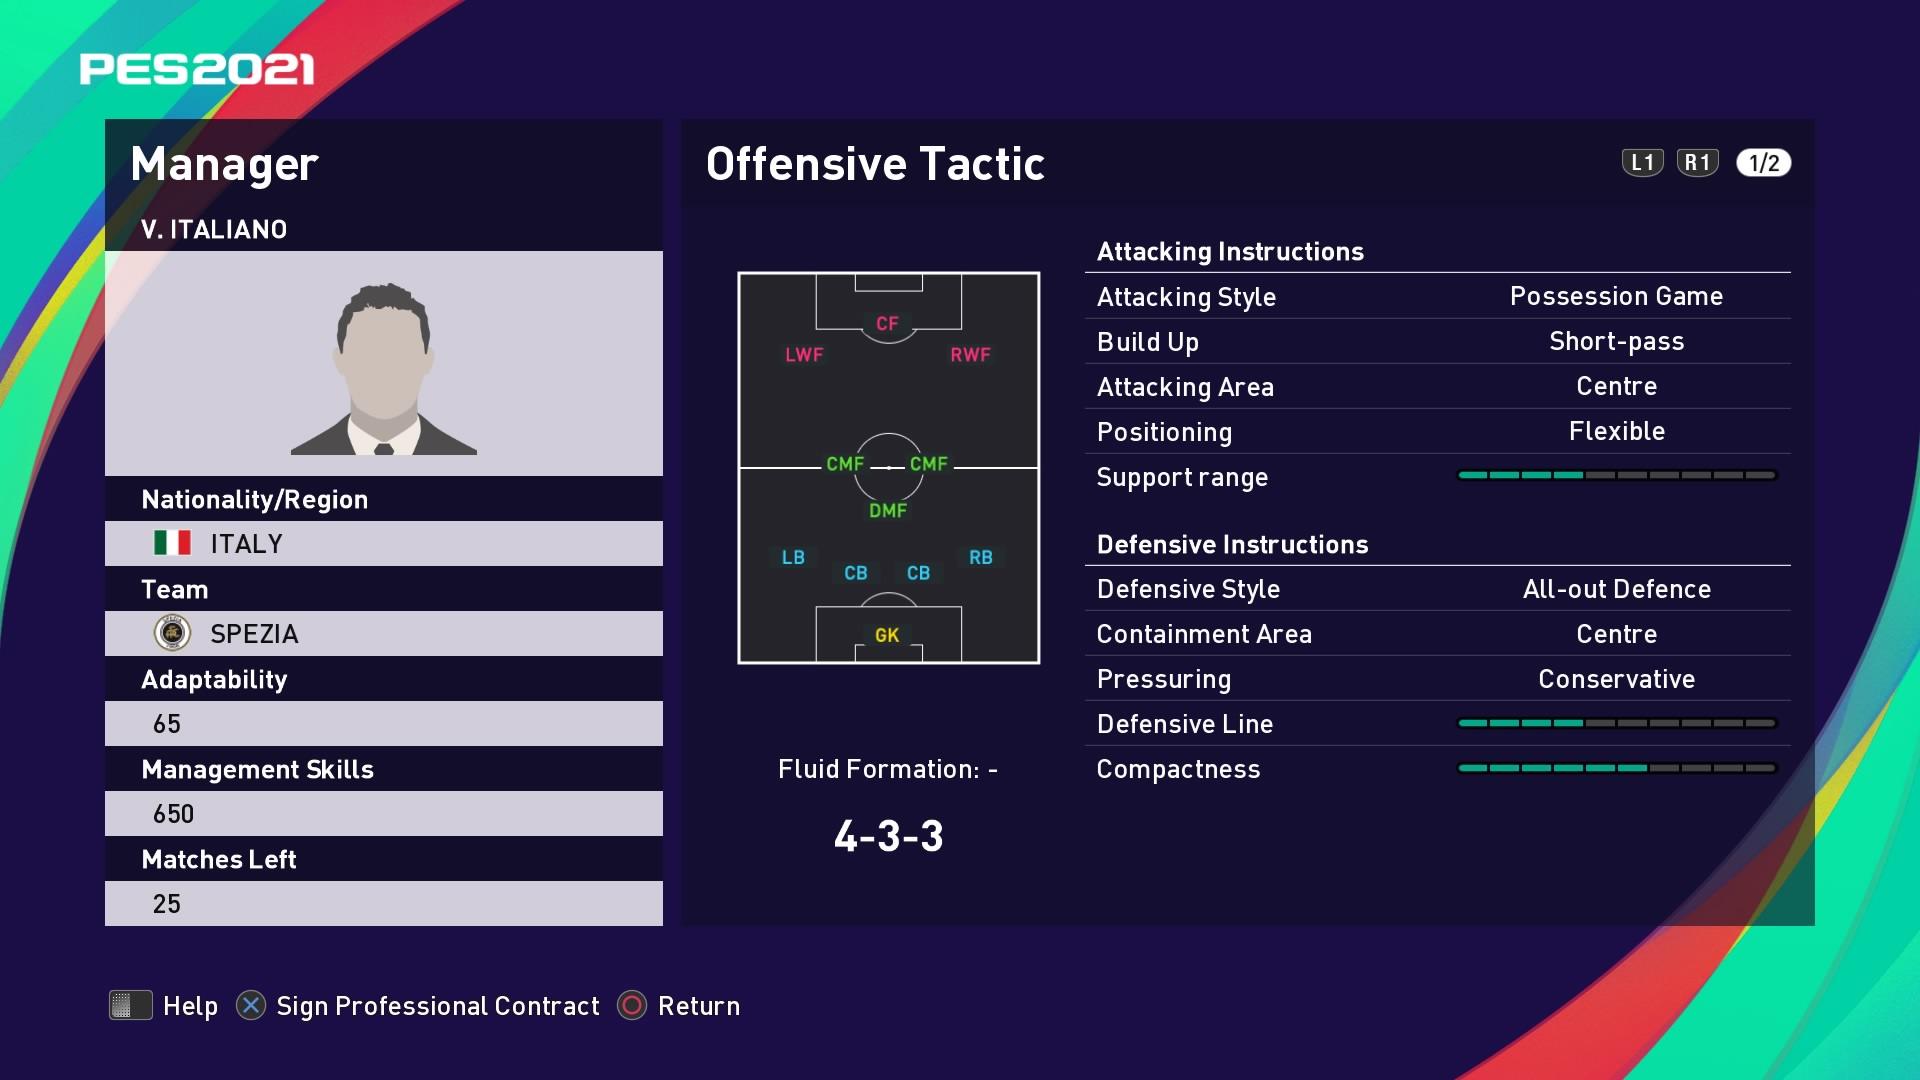 V. Italiano (Vincenzo Italiano) Offensive Tactic in PES 2021 myClub